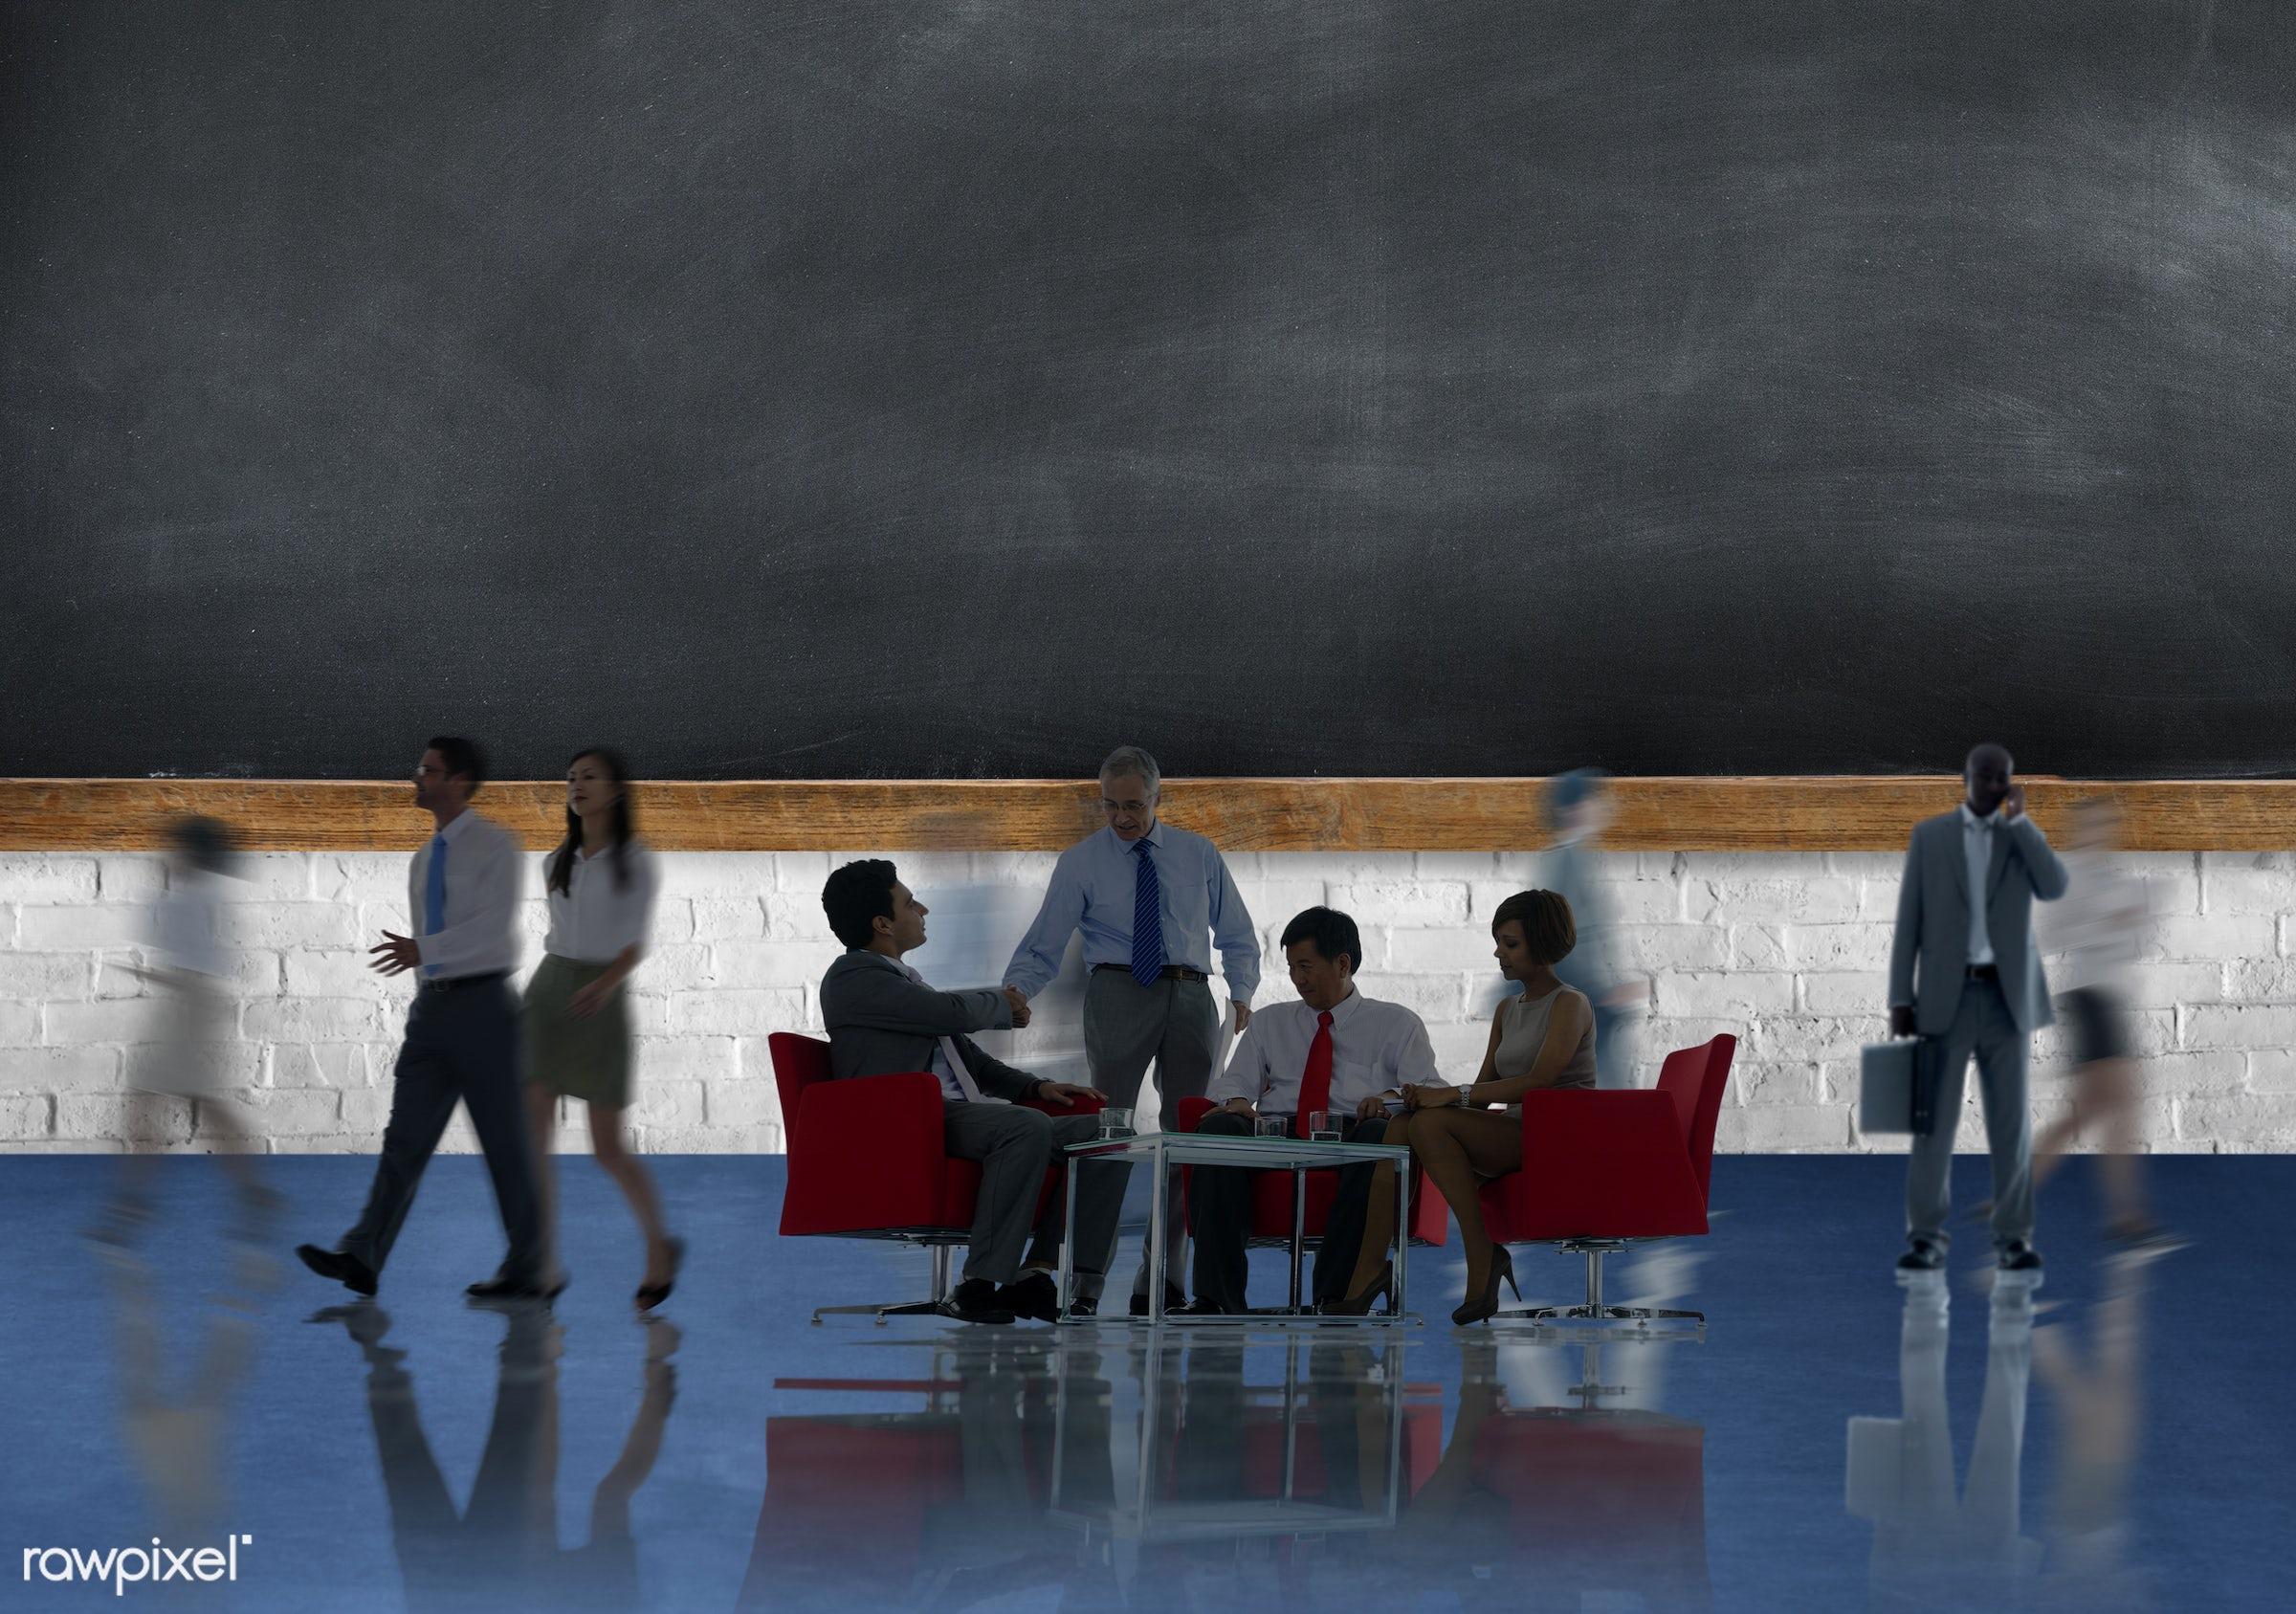 agreement, architecture, arranged, art, backgrounds, blackboard, blue, brainstorming, brick wall, bricks, brickwork, built...